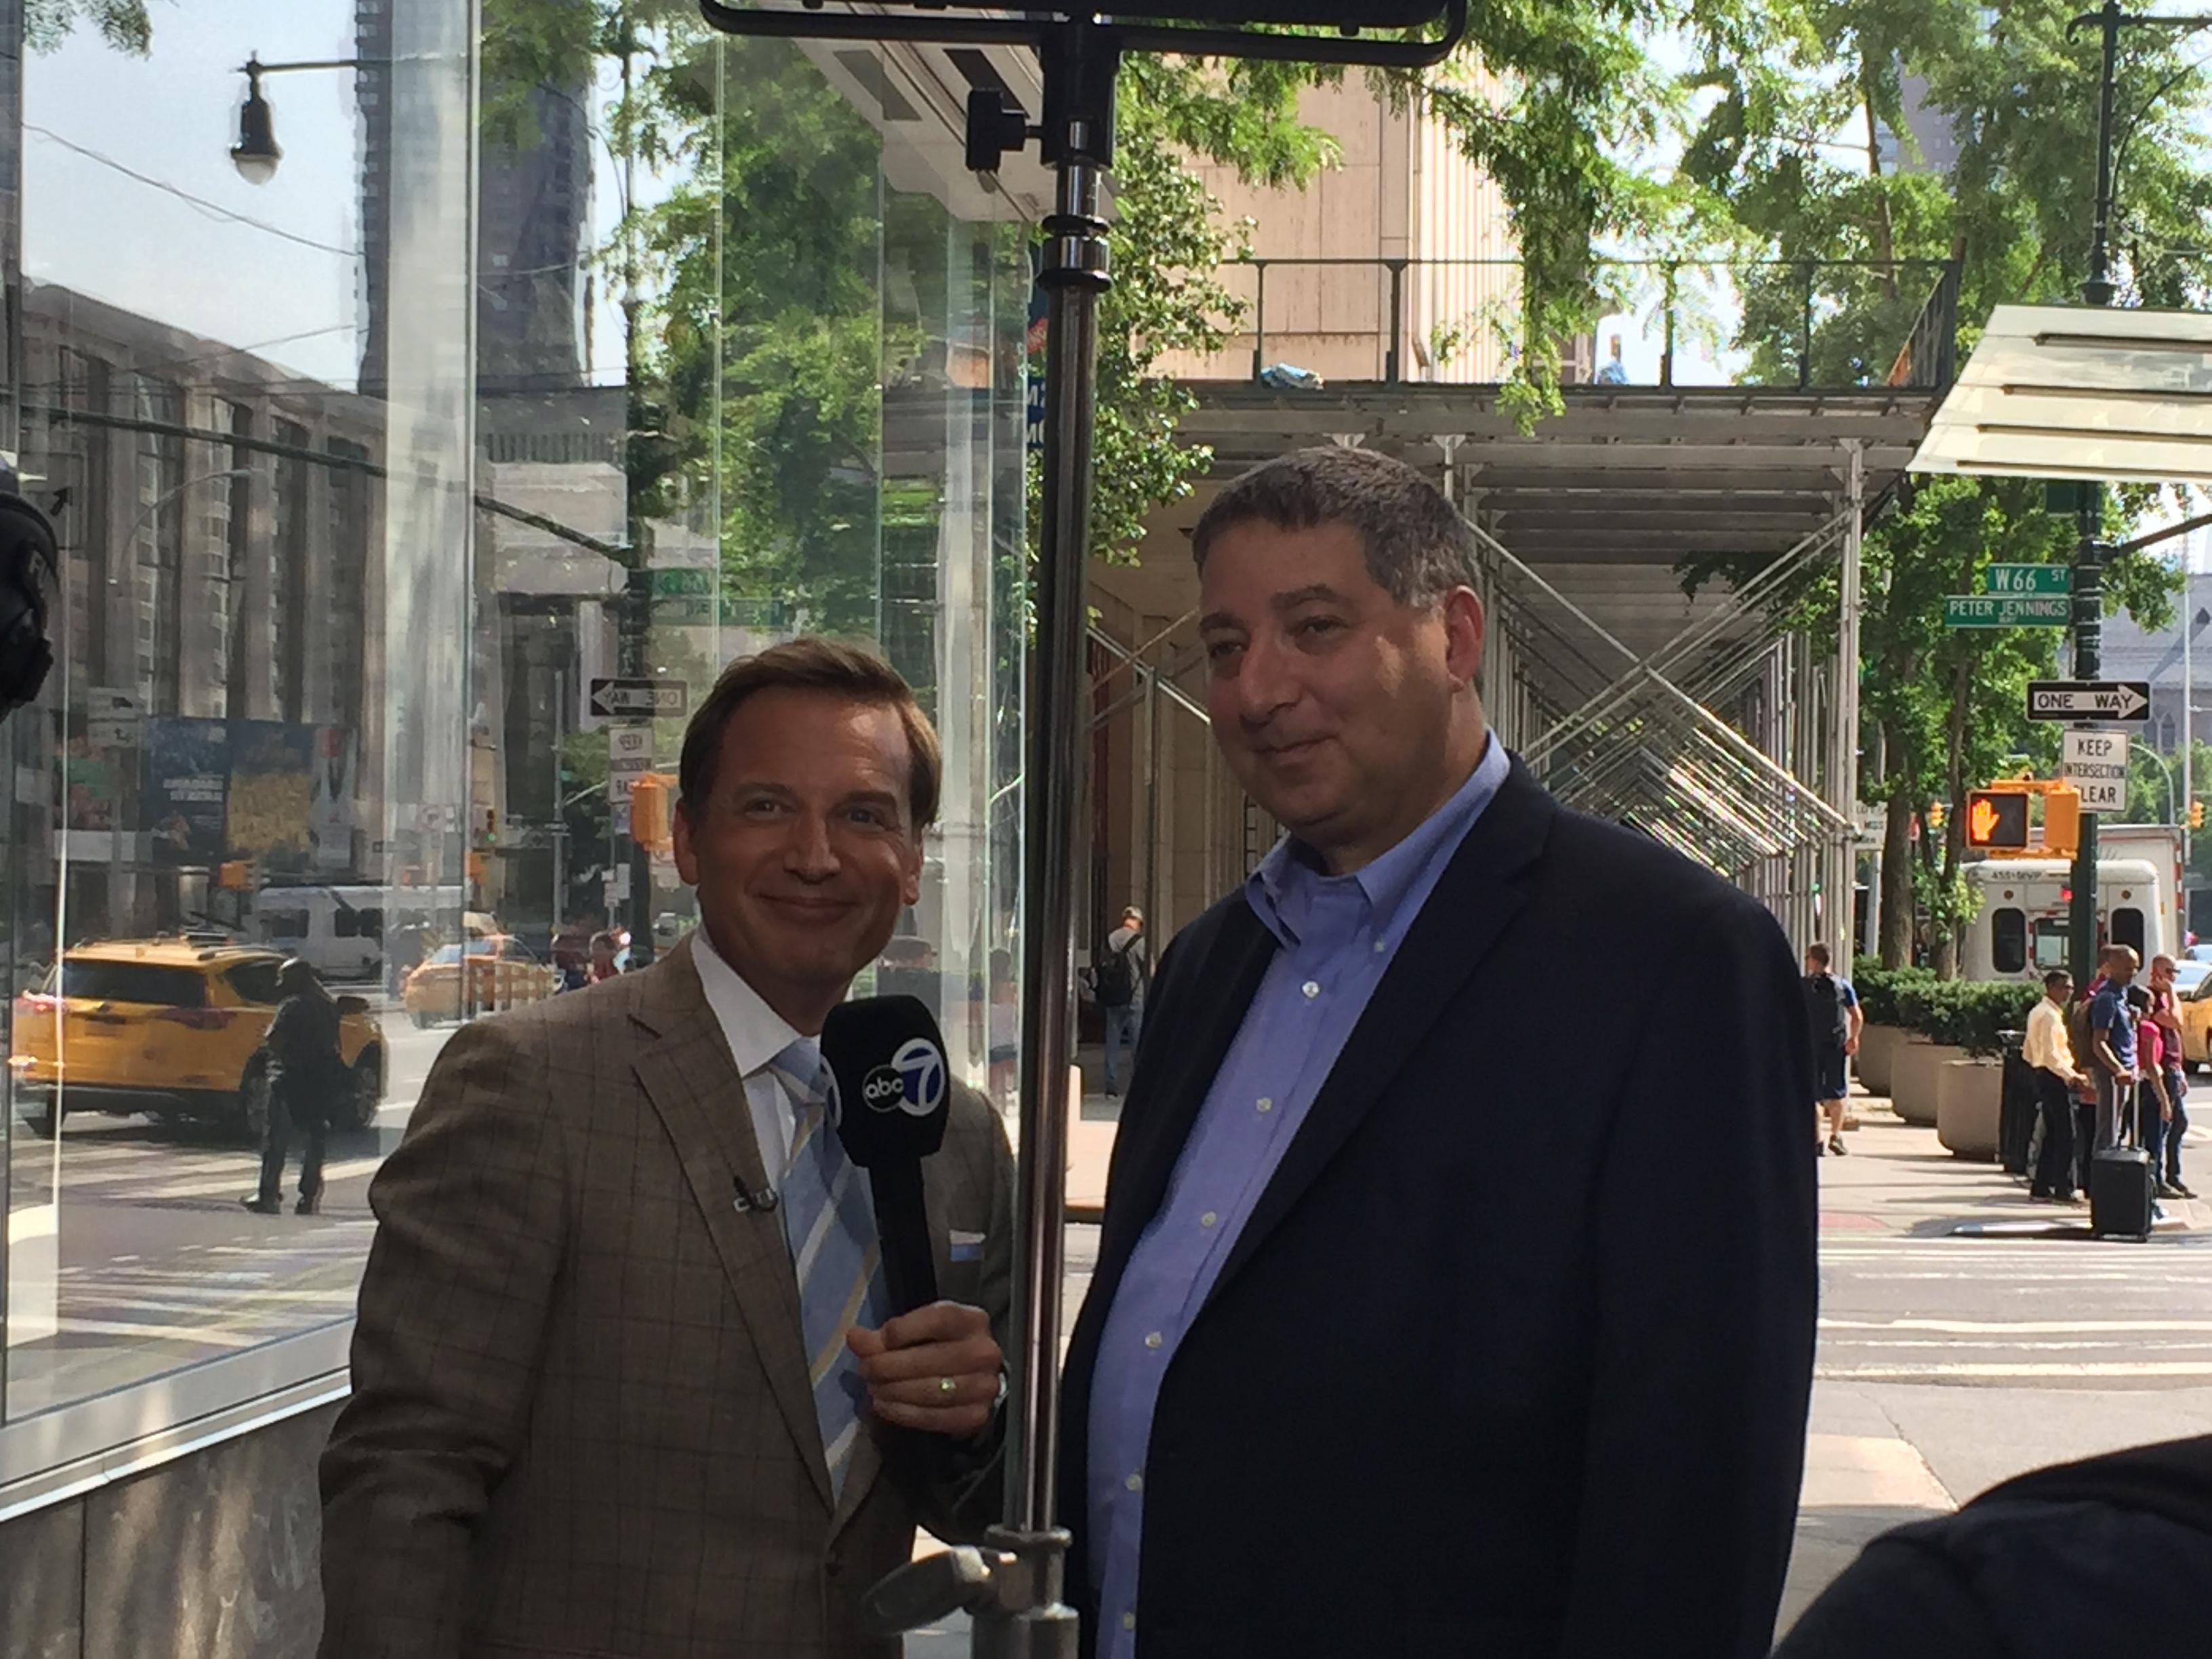 Behind the scenes with WABC weatherman Lee Goldberg and Lee Goldberg on the air (July 2018)